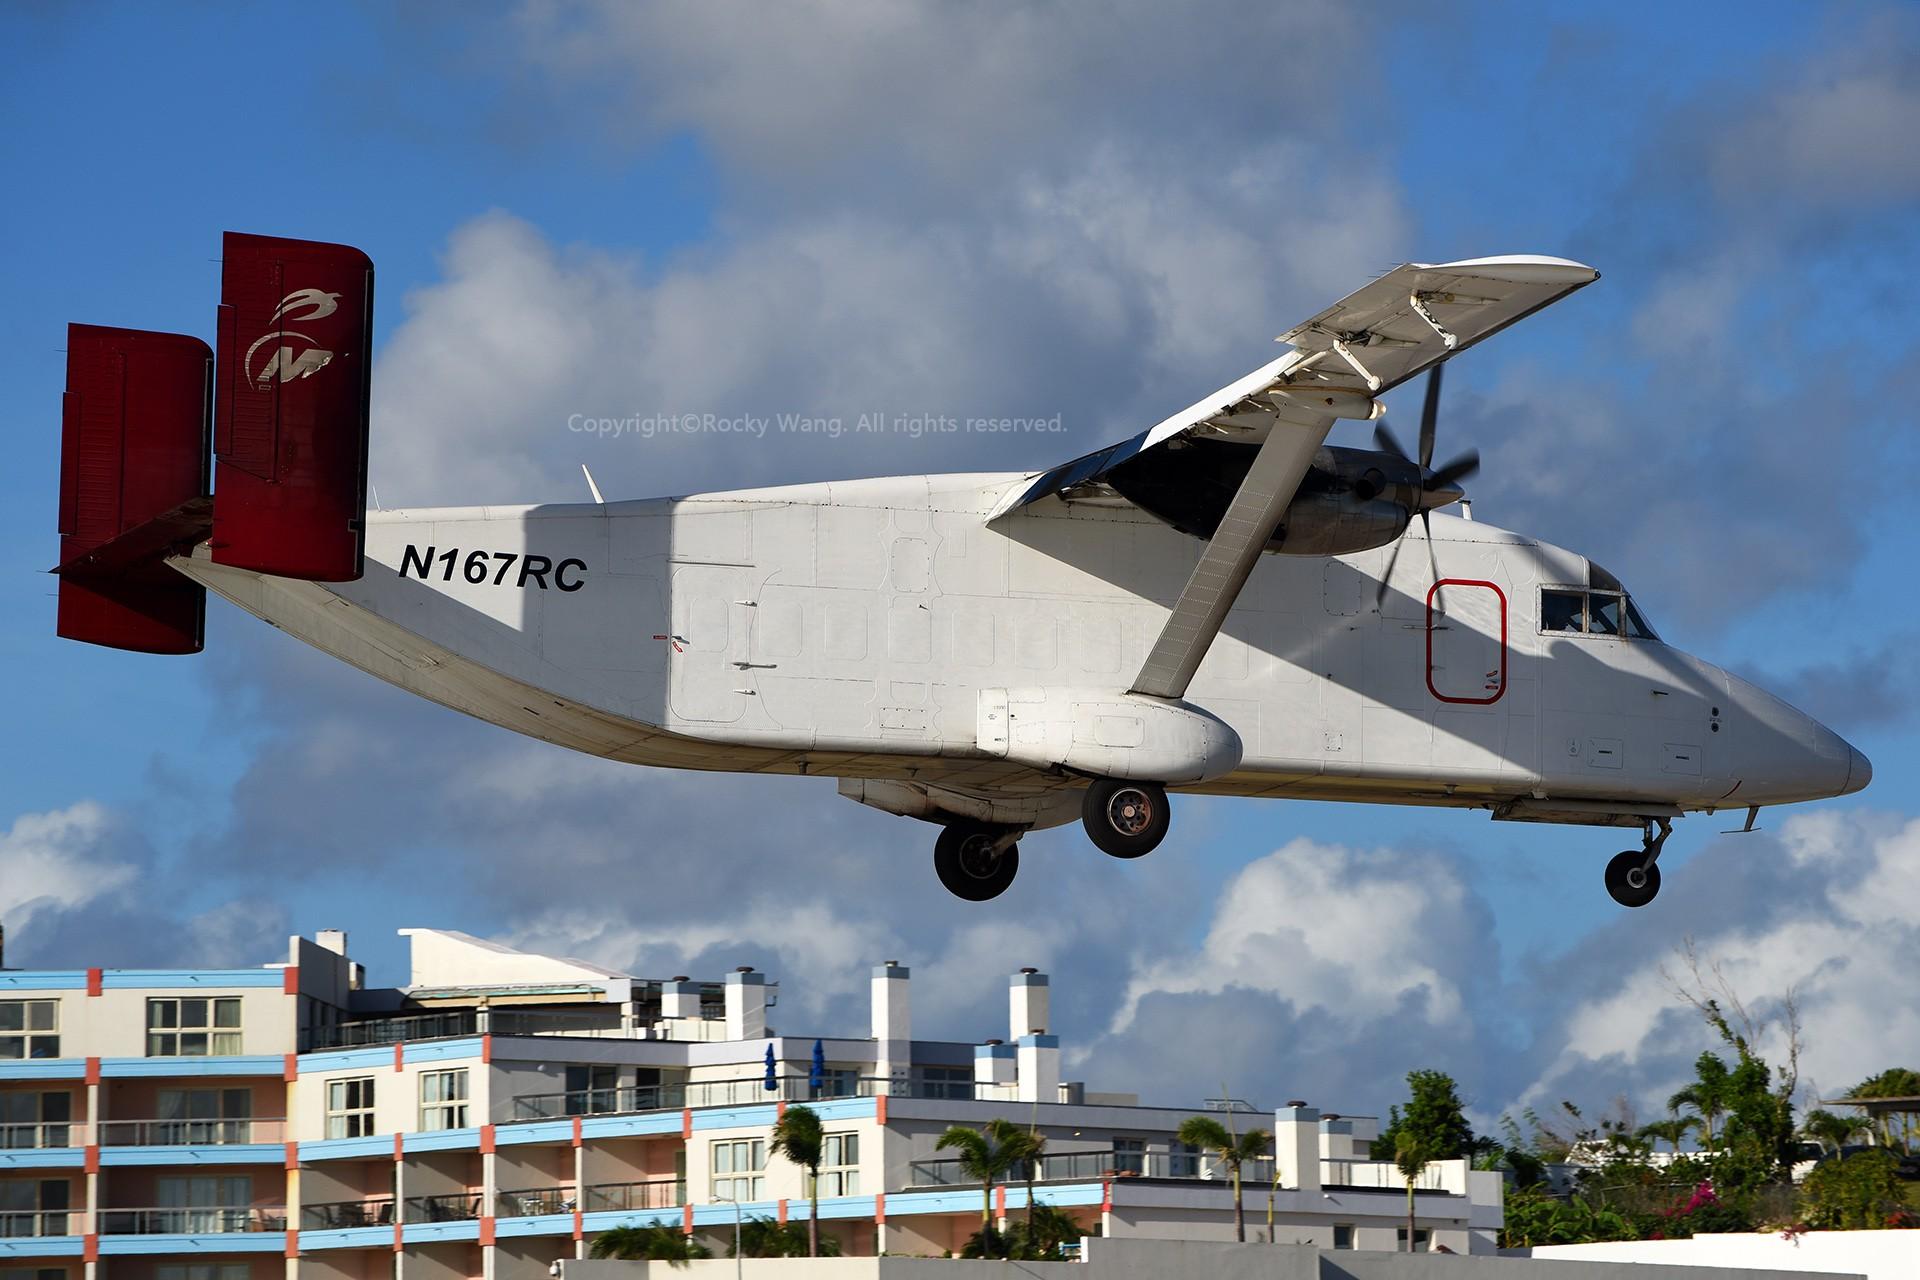 Re:[原创]My endless Caribbean dream——圣马丁朱莉安娜公主机场拍机记 SHORT 330-200 N167RC 荷属安的列斯群岛朱利安娜公主机场